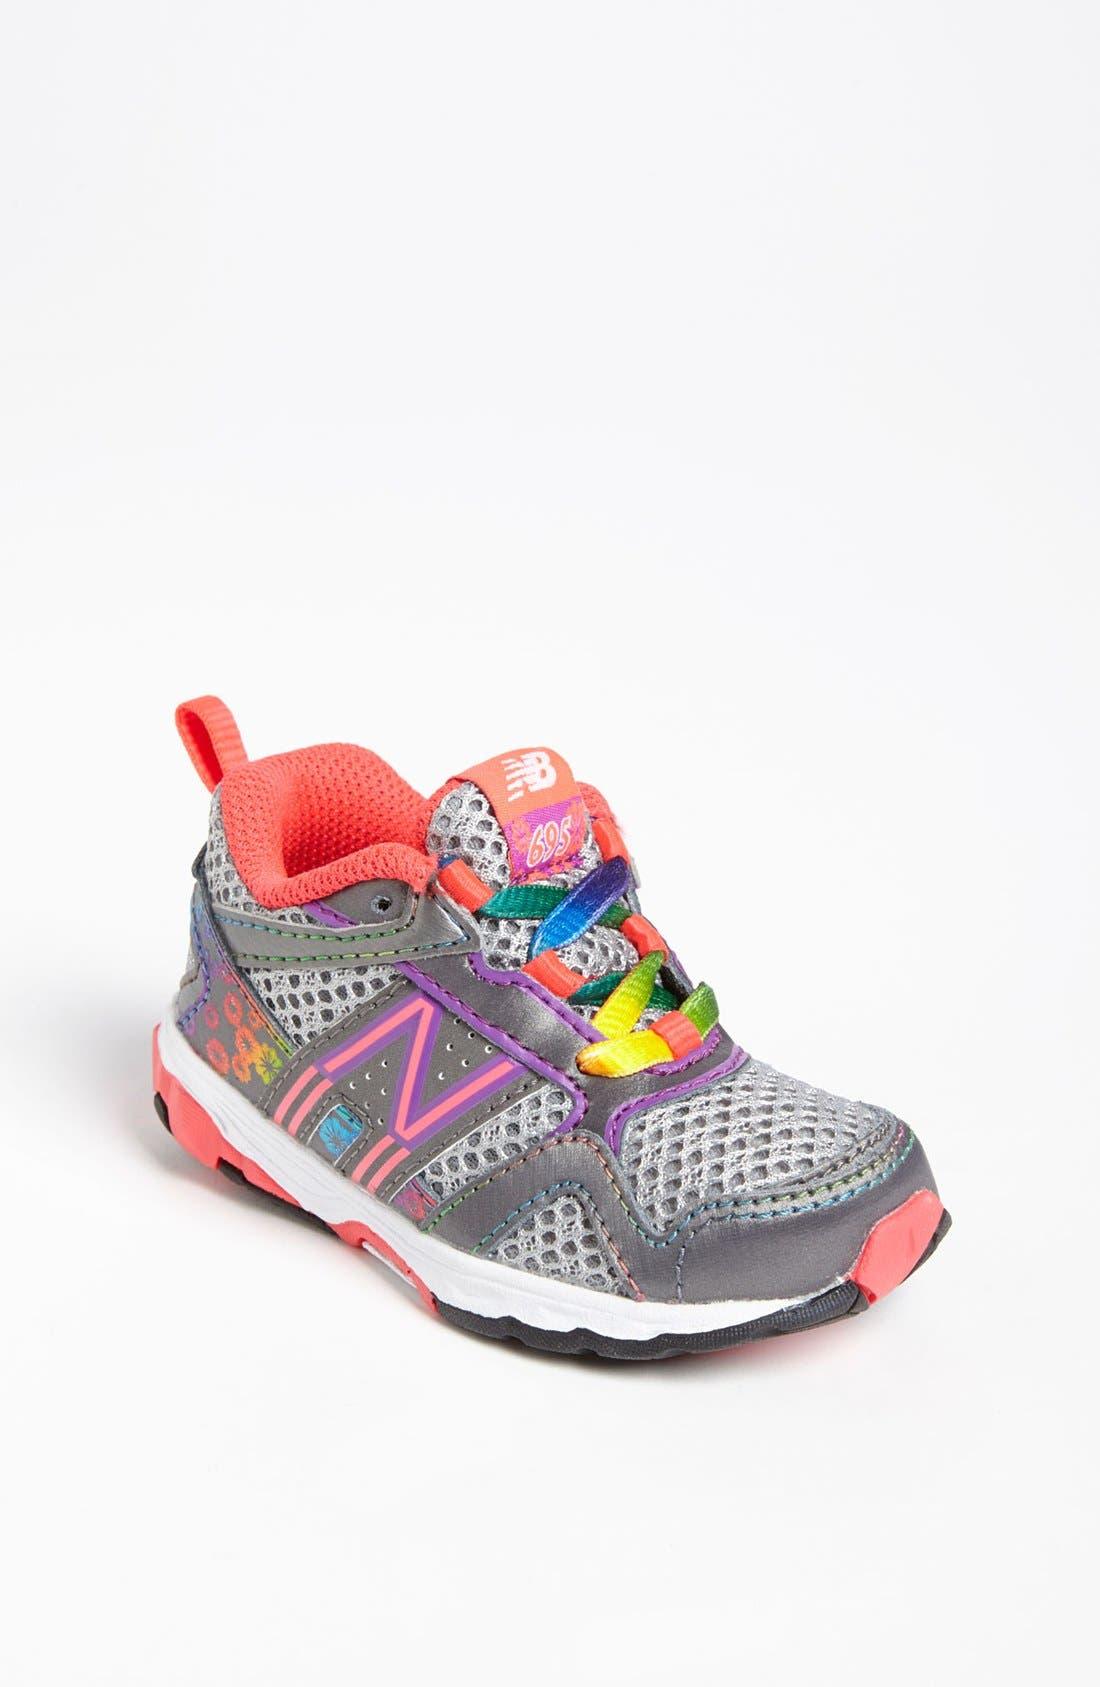 Alternate Image 1 Selected - New Balance '695' Sneaker (Baby, Walker & Toddler) (Online Only)